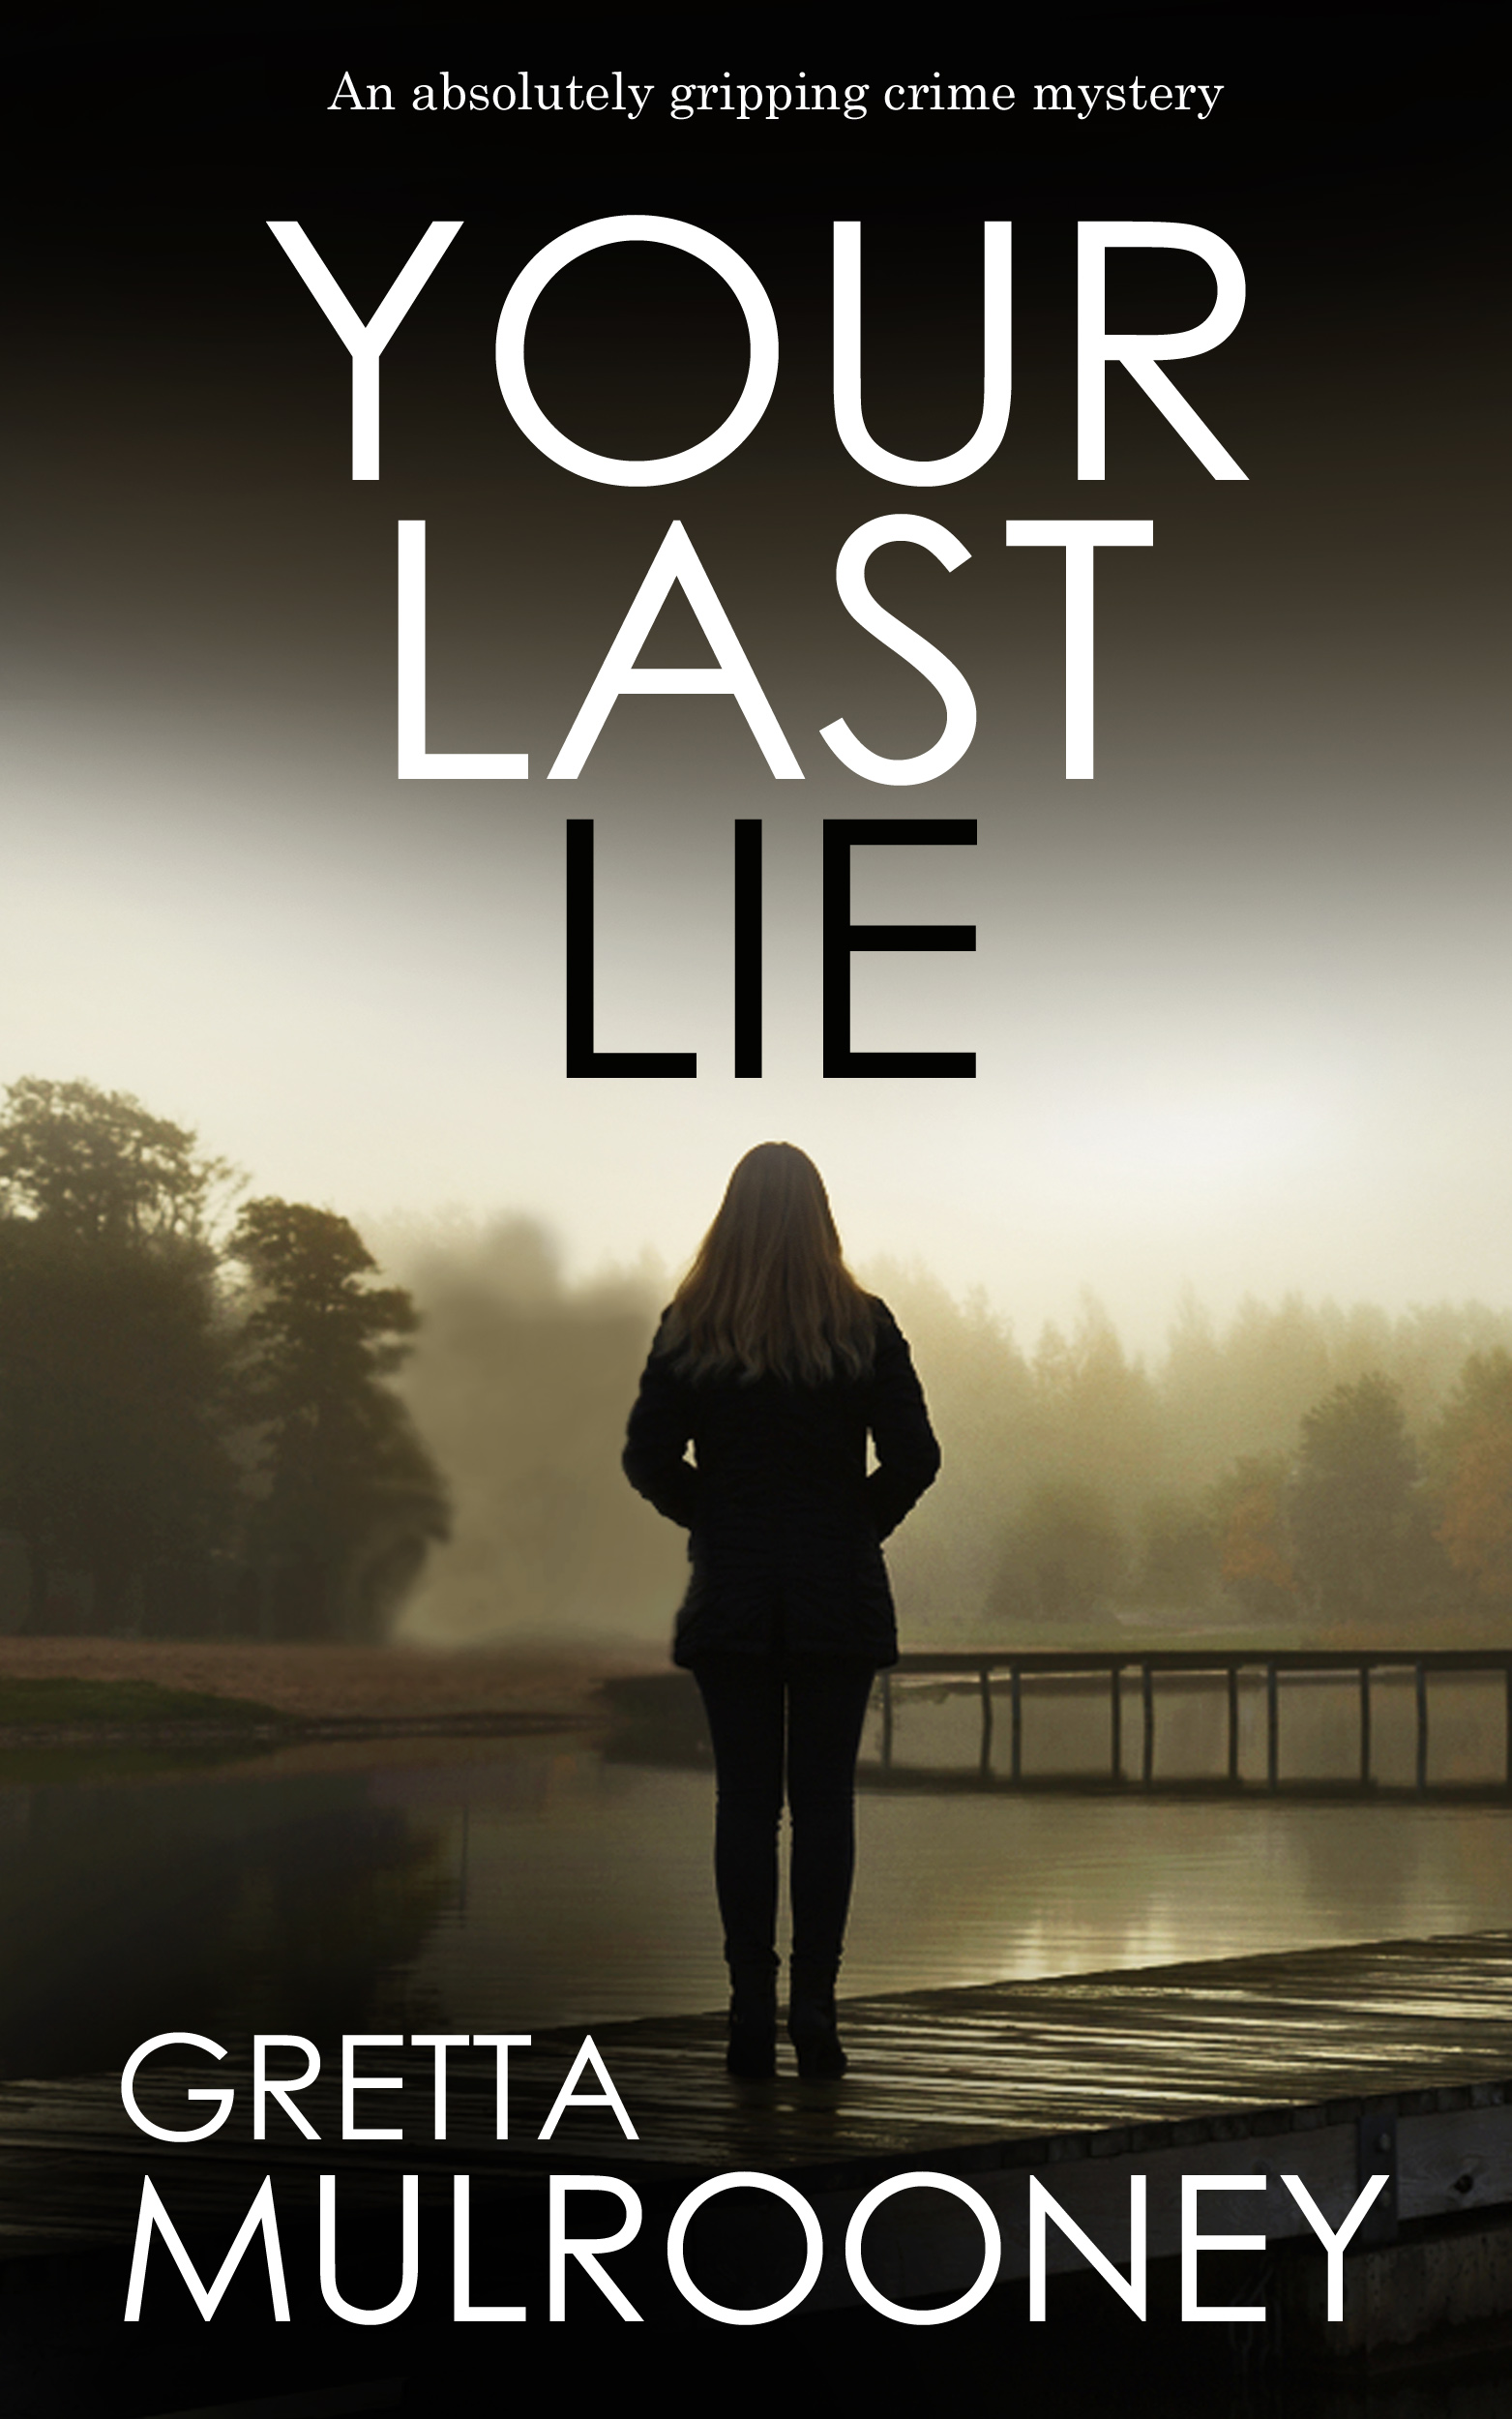 YOUR LAST LIE.jpg